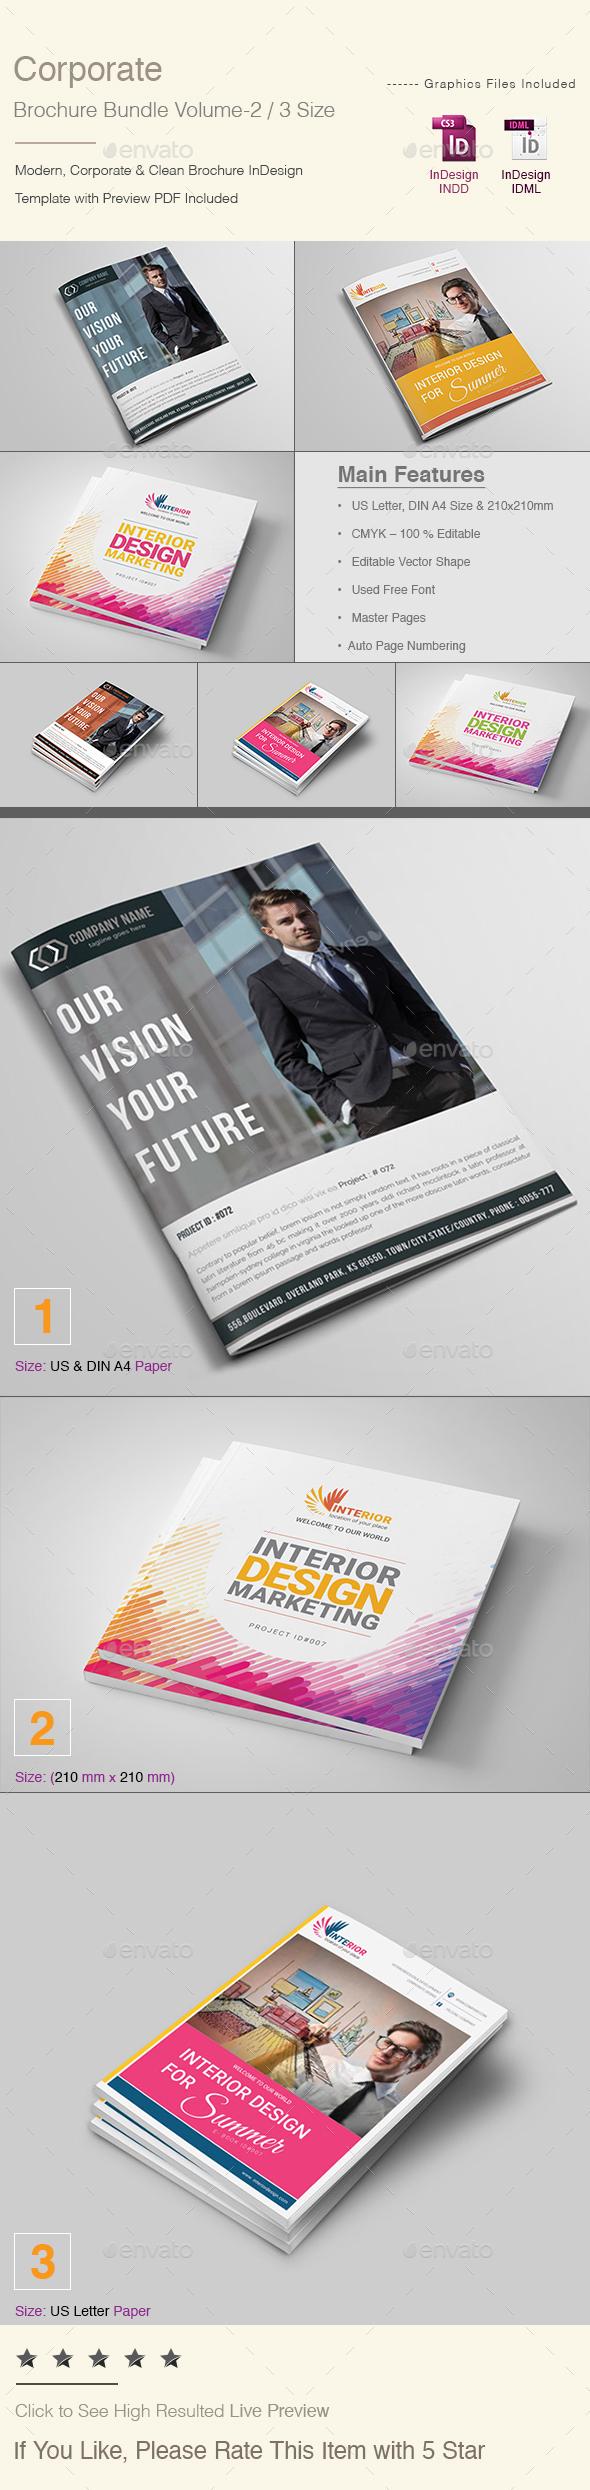 Corporate Brochure Bundle | Volume - 2 - Corporate Brochures